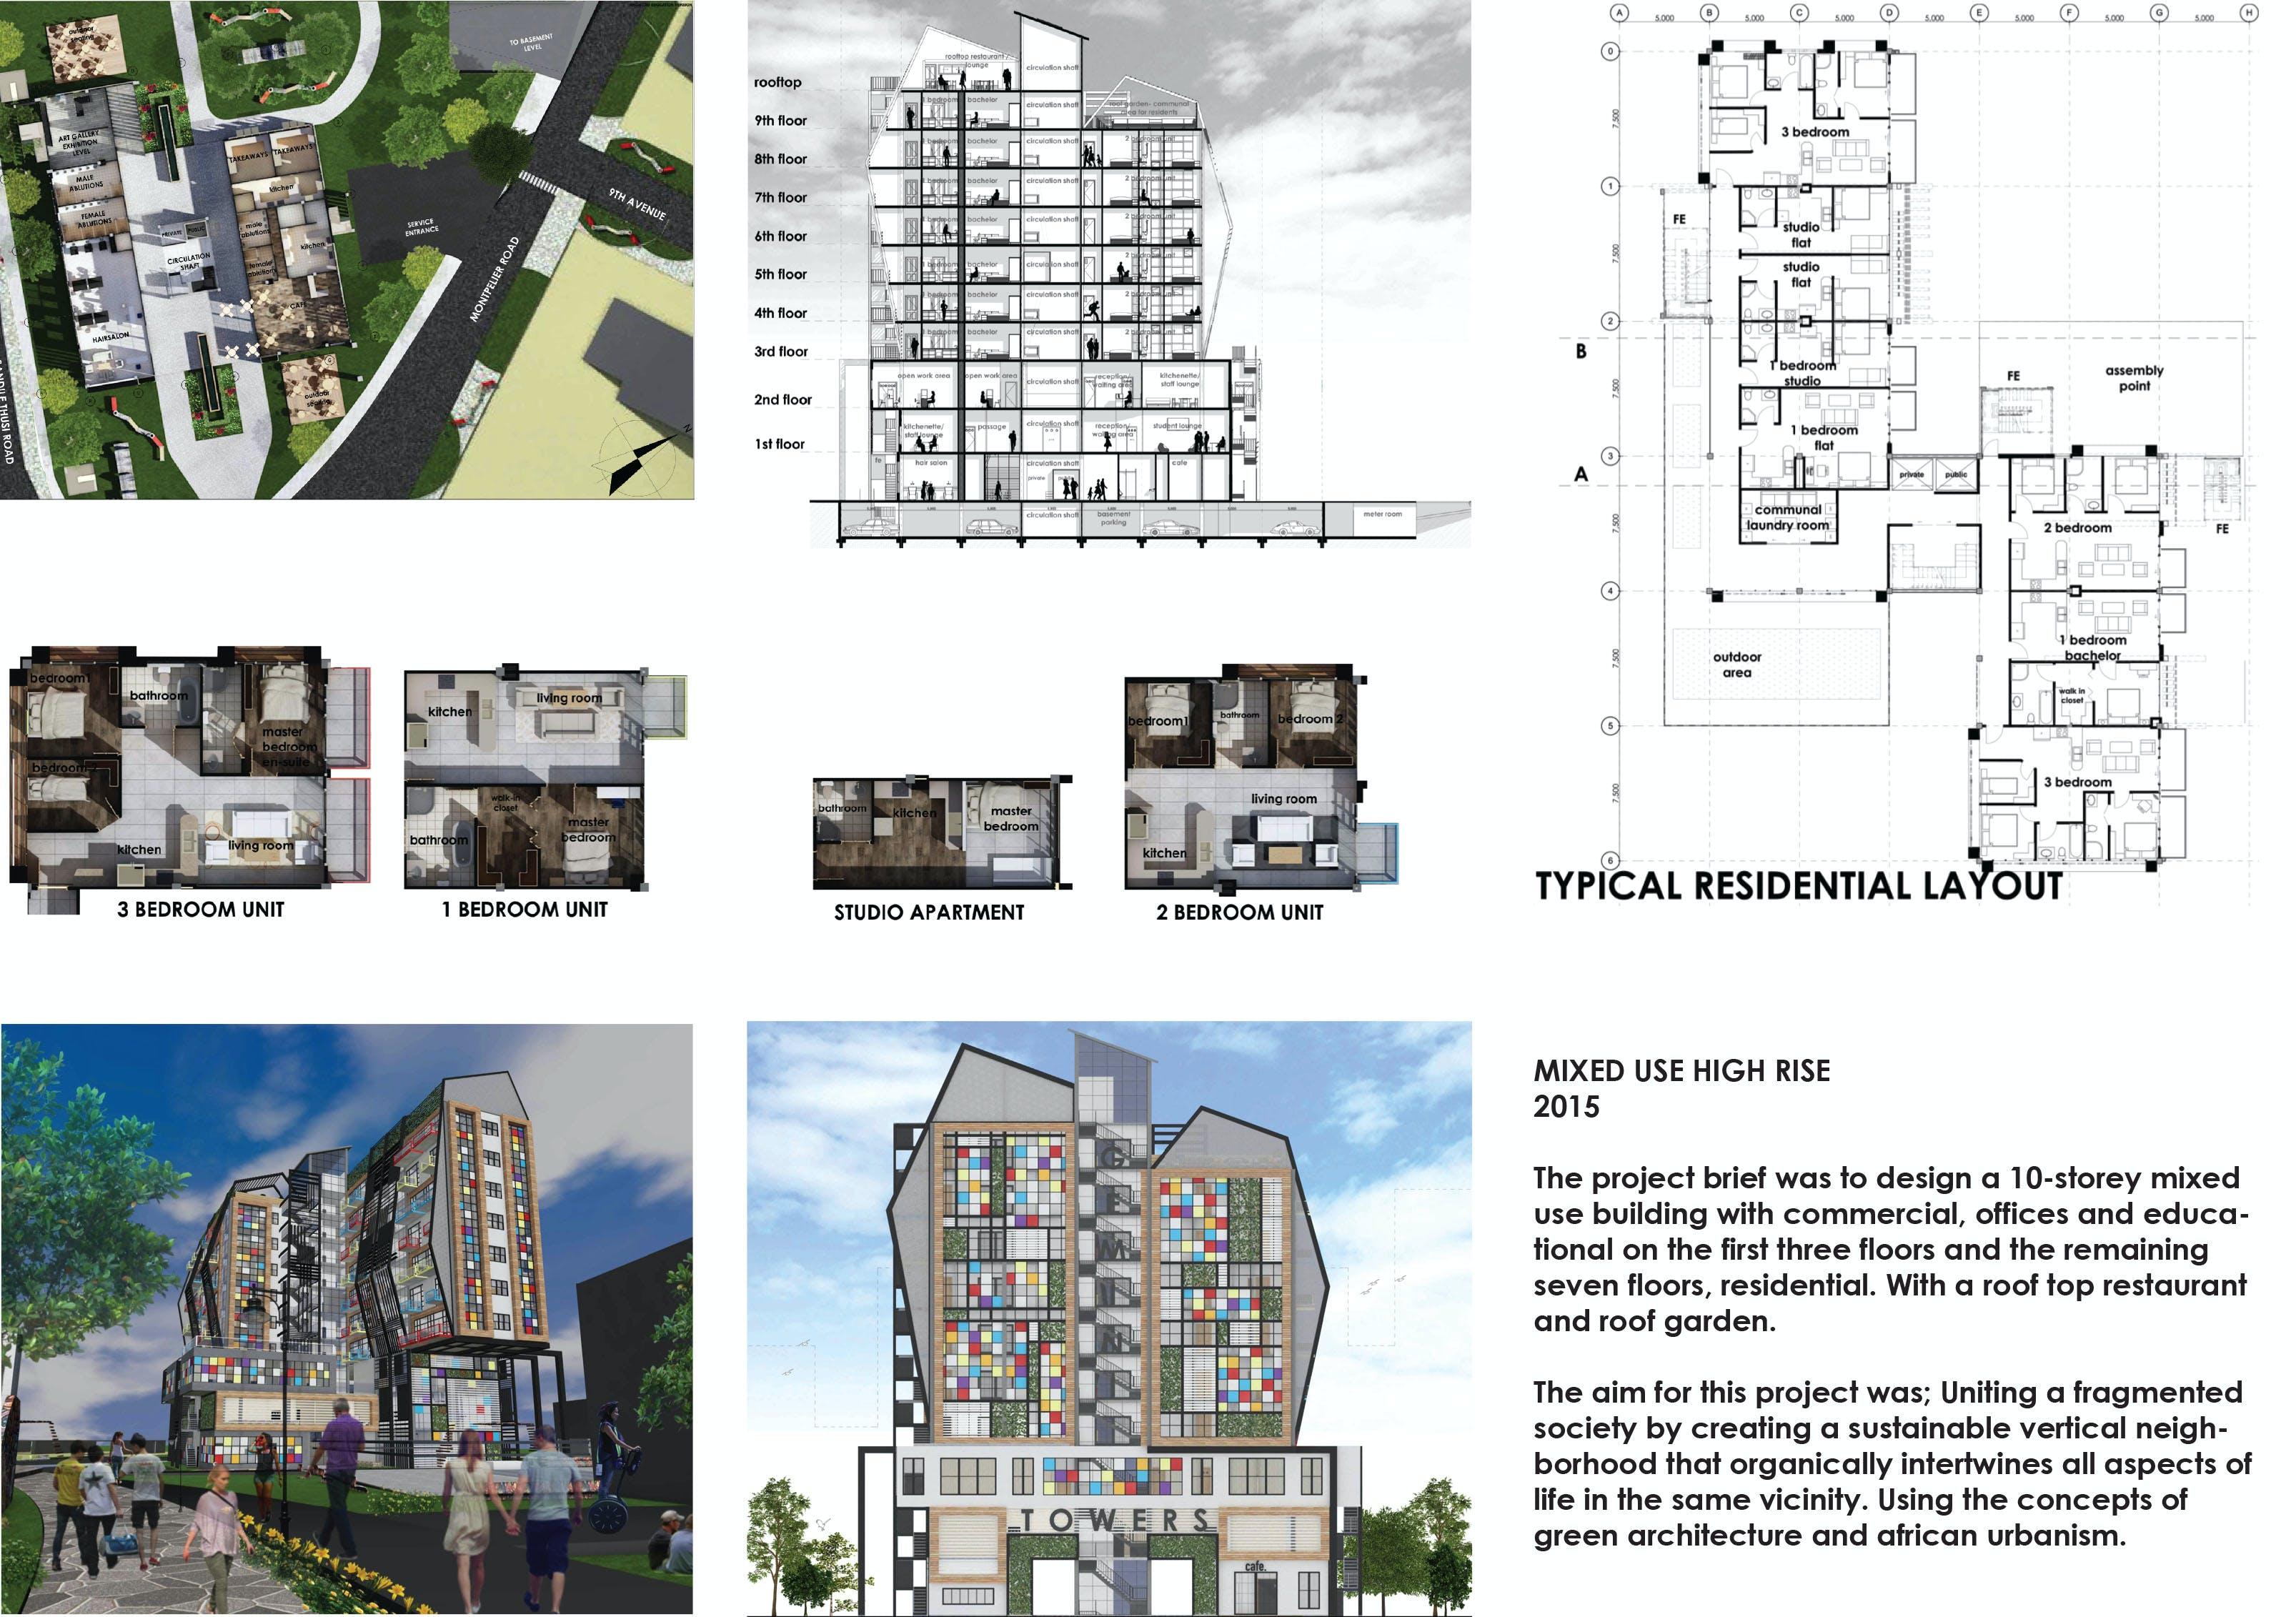 Mixed use high rise tobi ashiru archinect